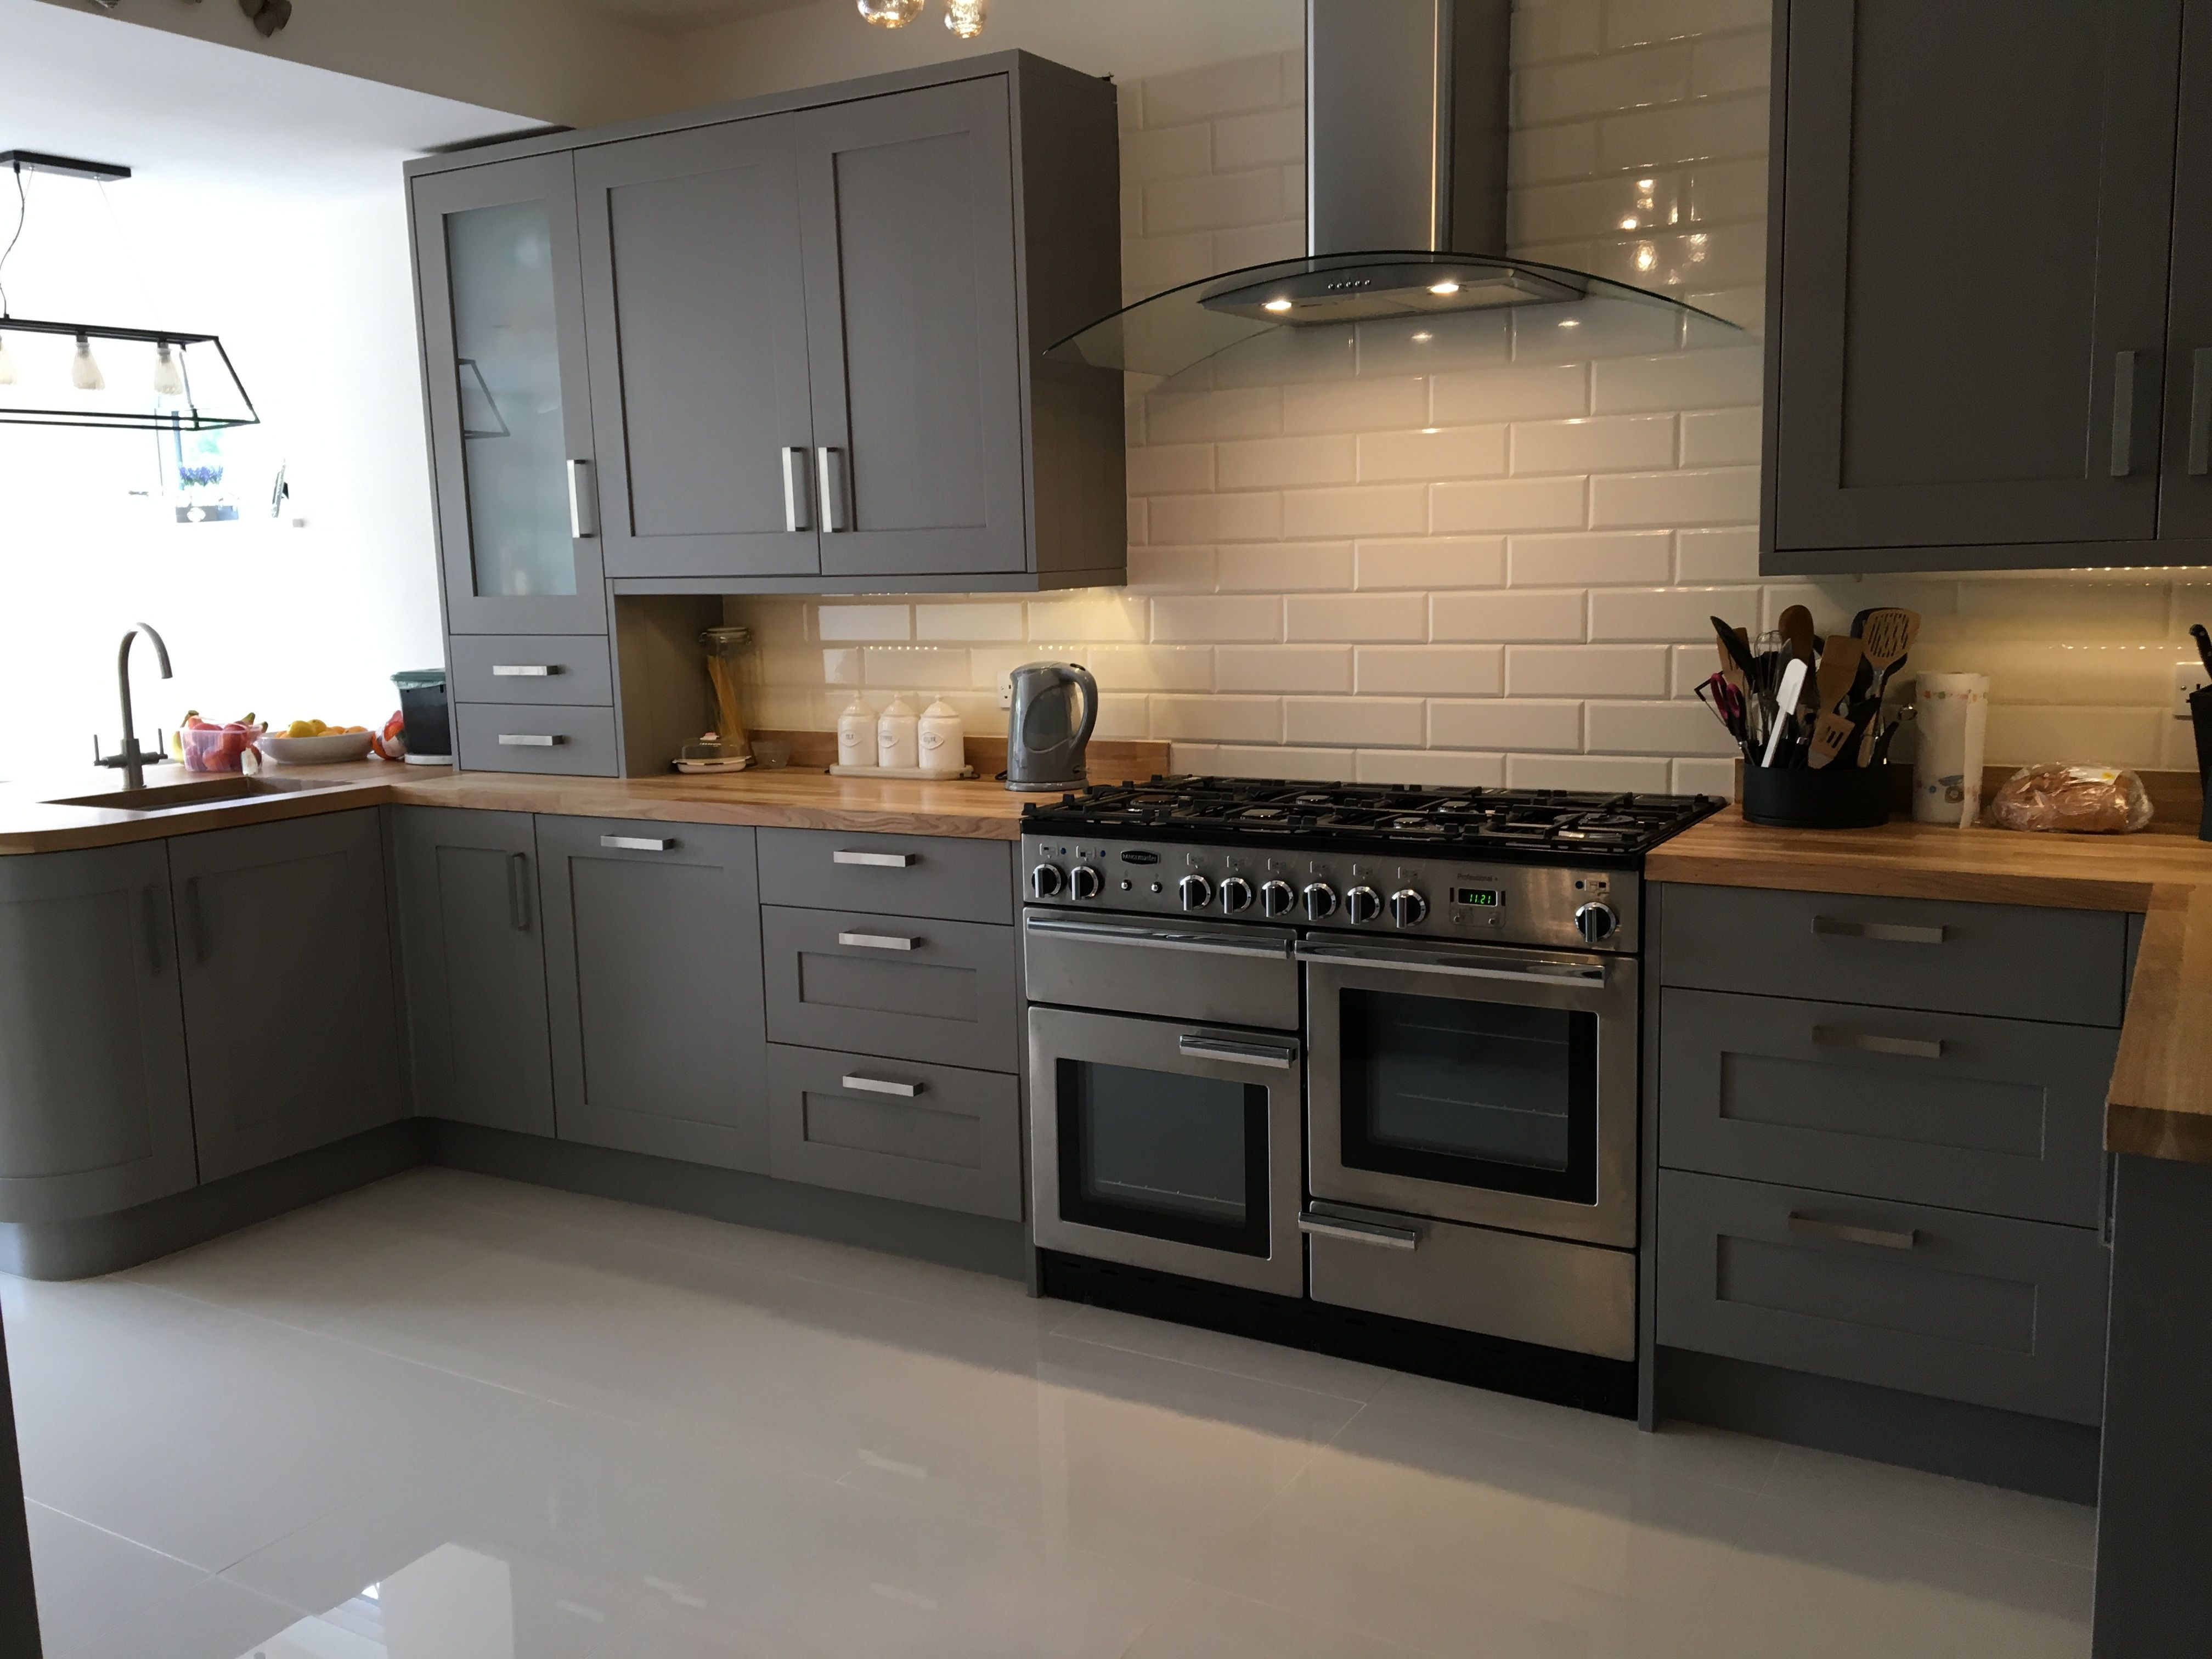 Carisbrook Taupe B & Q kitchen with oak worktops